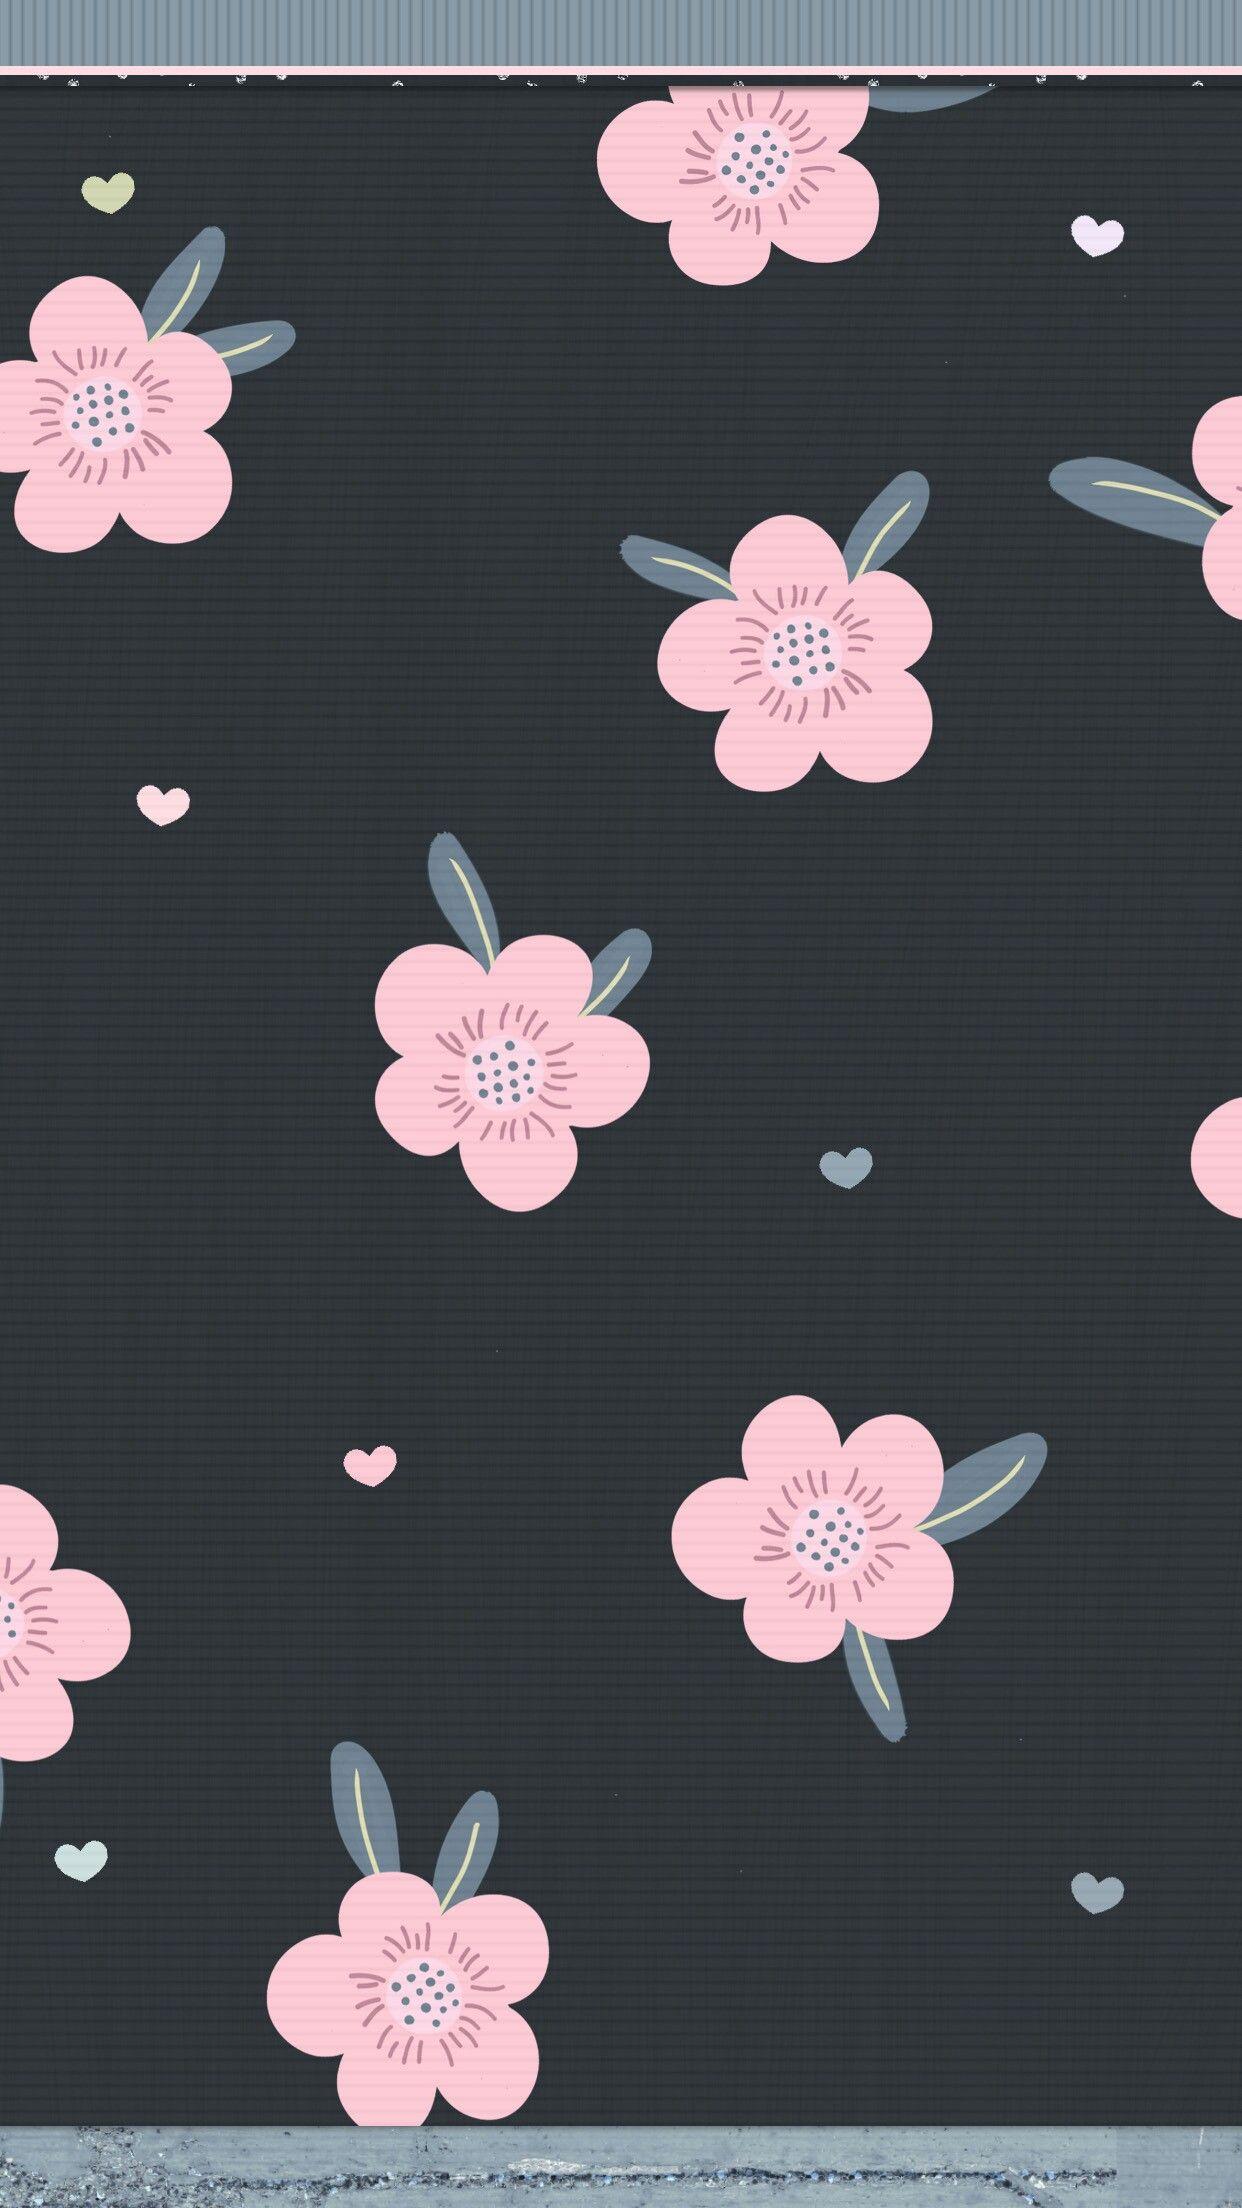 Download Wallpaper Hello Kitty Gray - eb3b3bfce02dfb9e7ae35a8f341615fc  Collection_475858.jpg